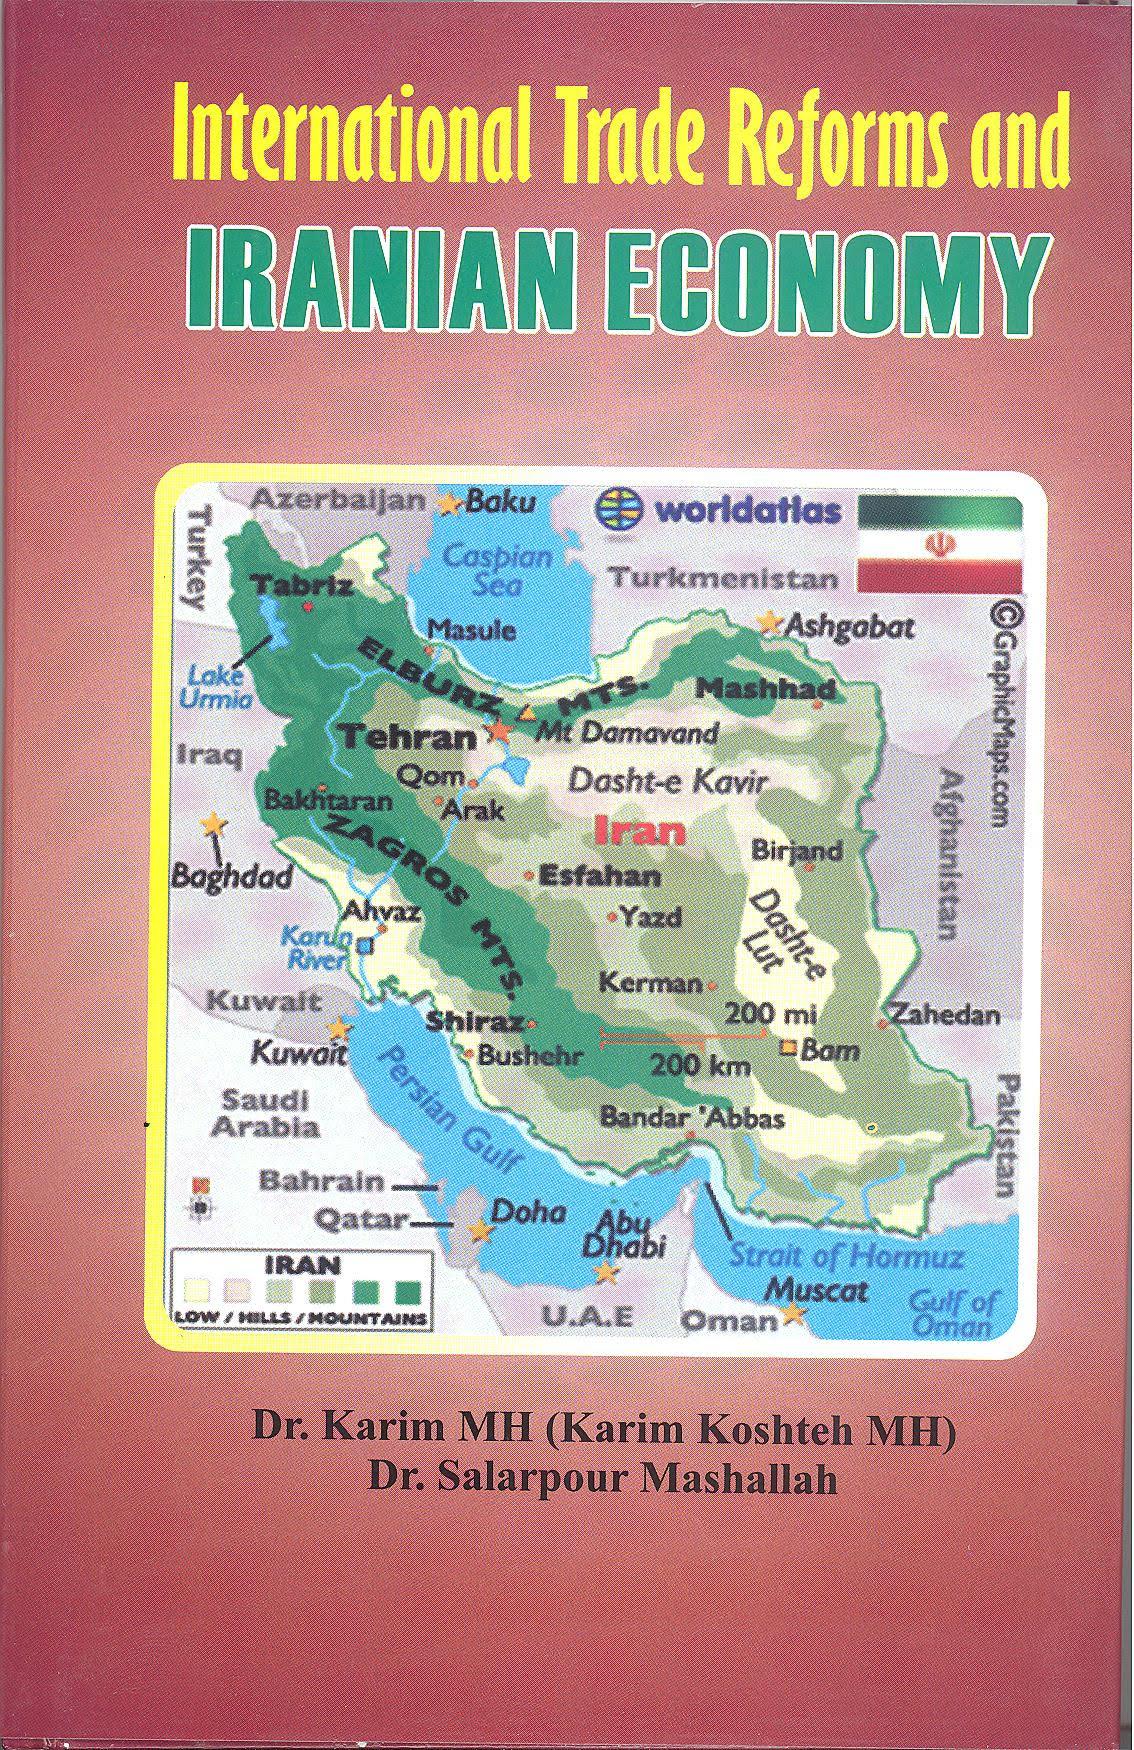 International Trade Reforms and Iranian Economy